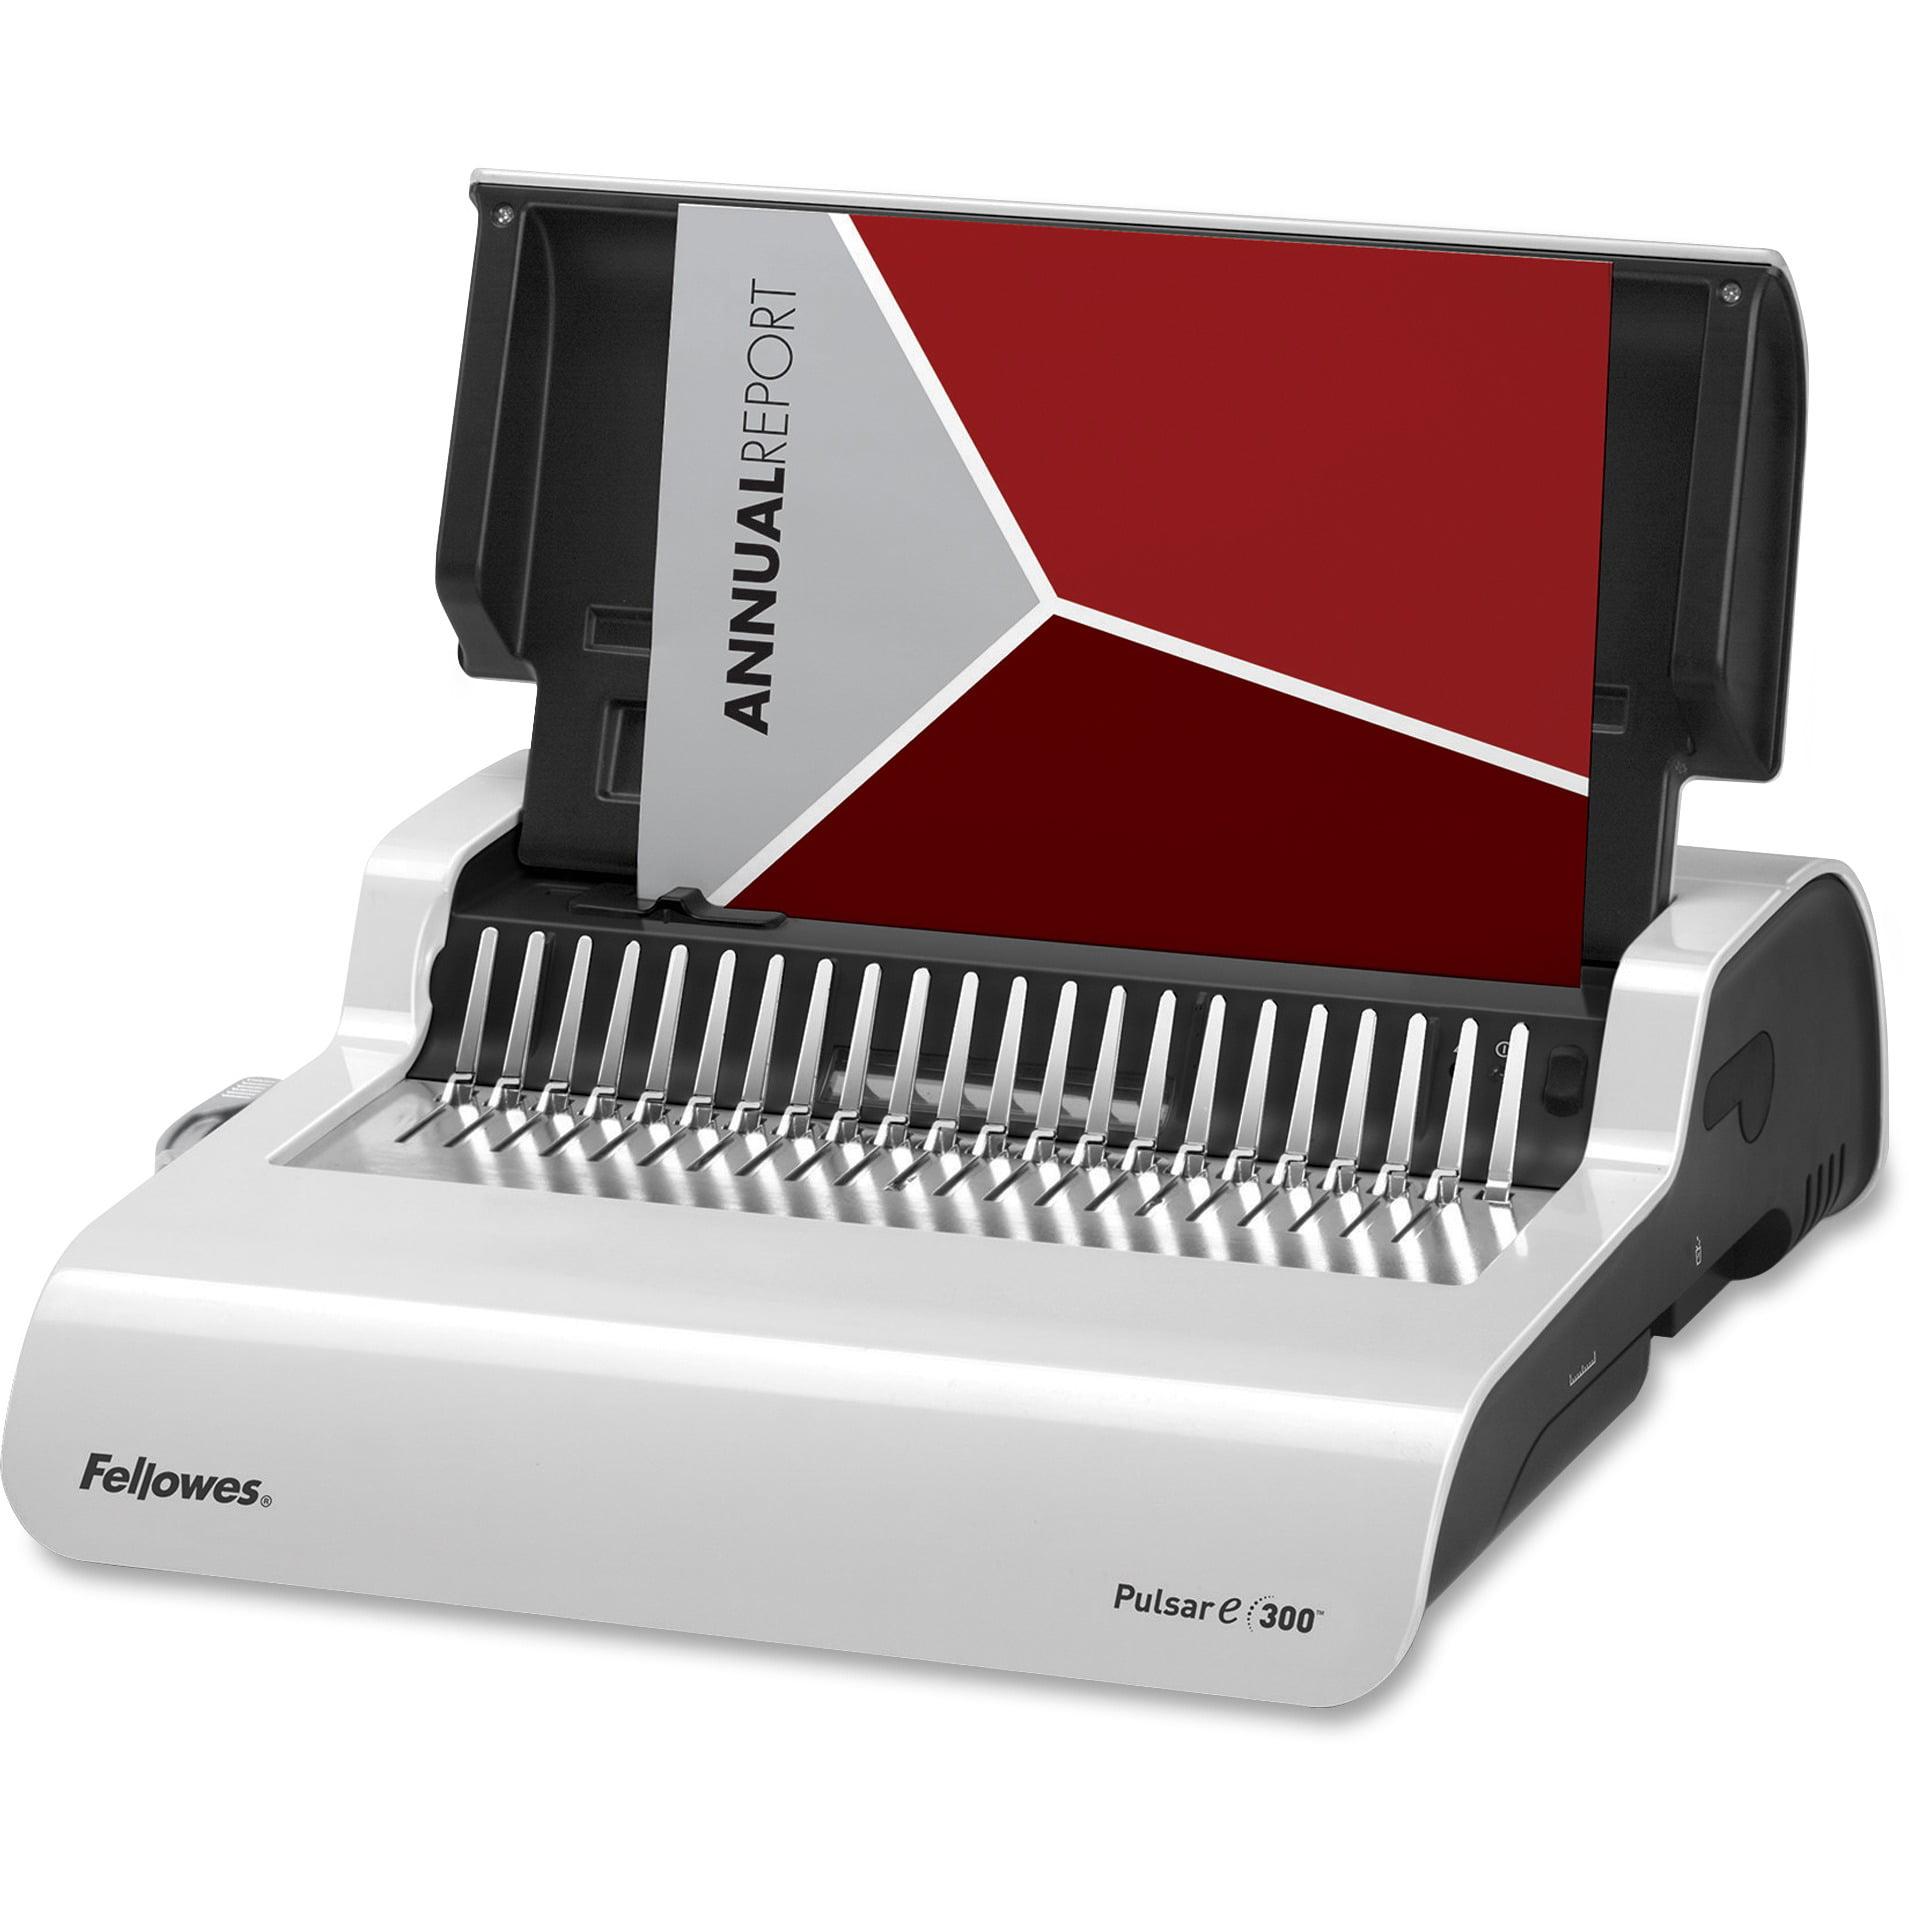 Fellowes, FEL5216701, Pulsar E300 Comb Electric Binding Machine, 1 Each, White,Black